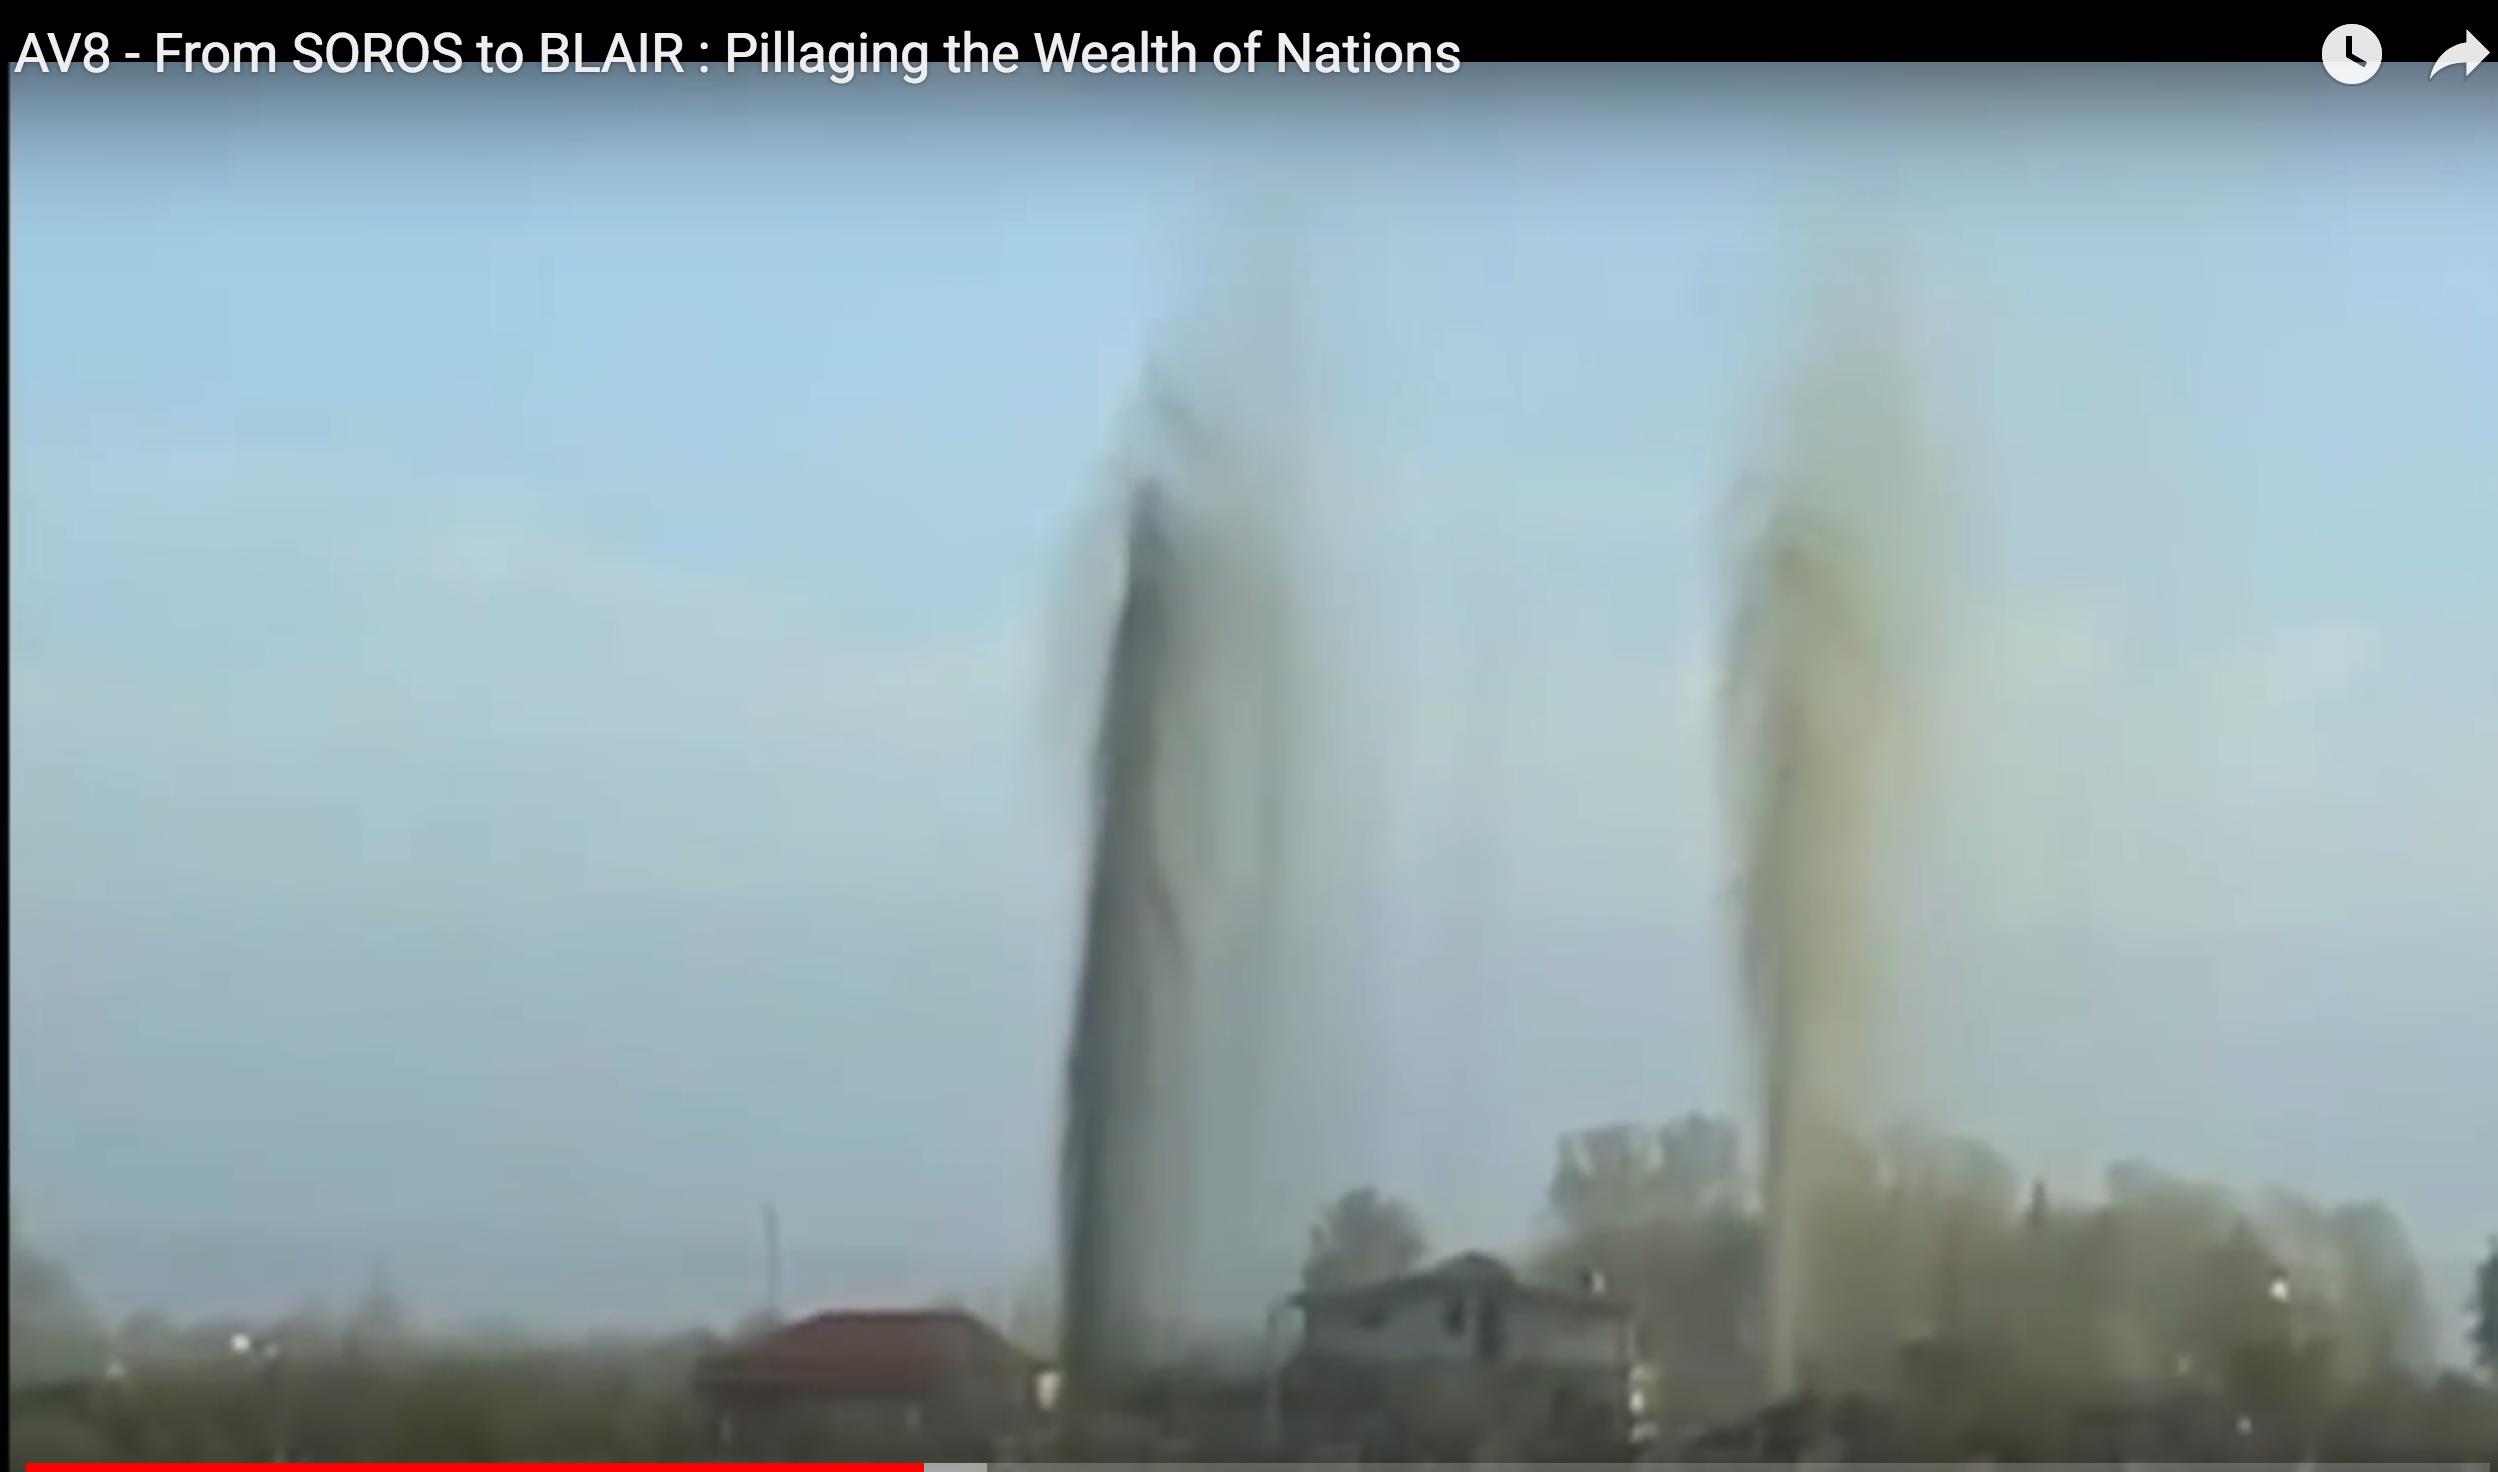 Fracking pollution